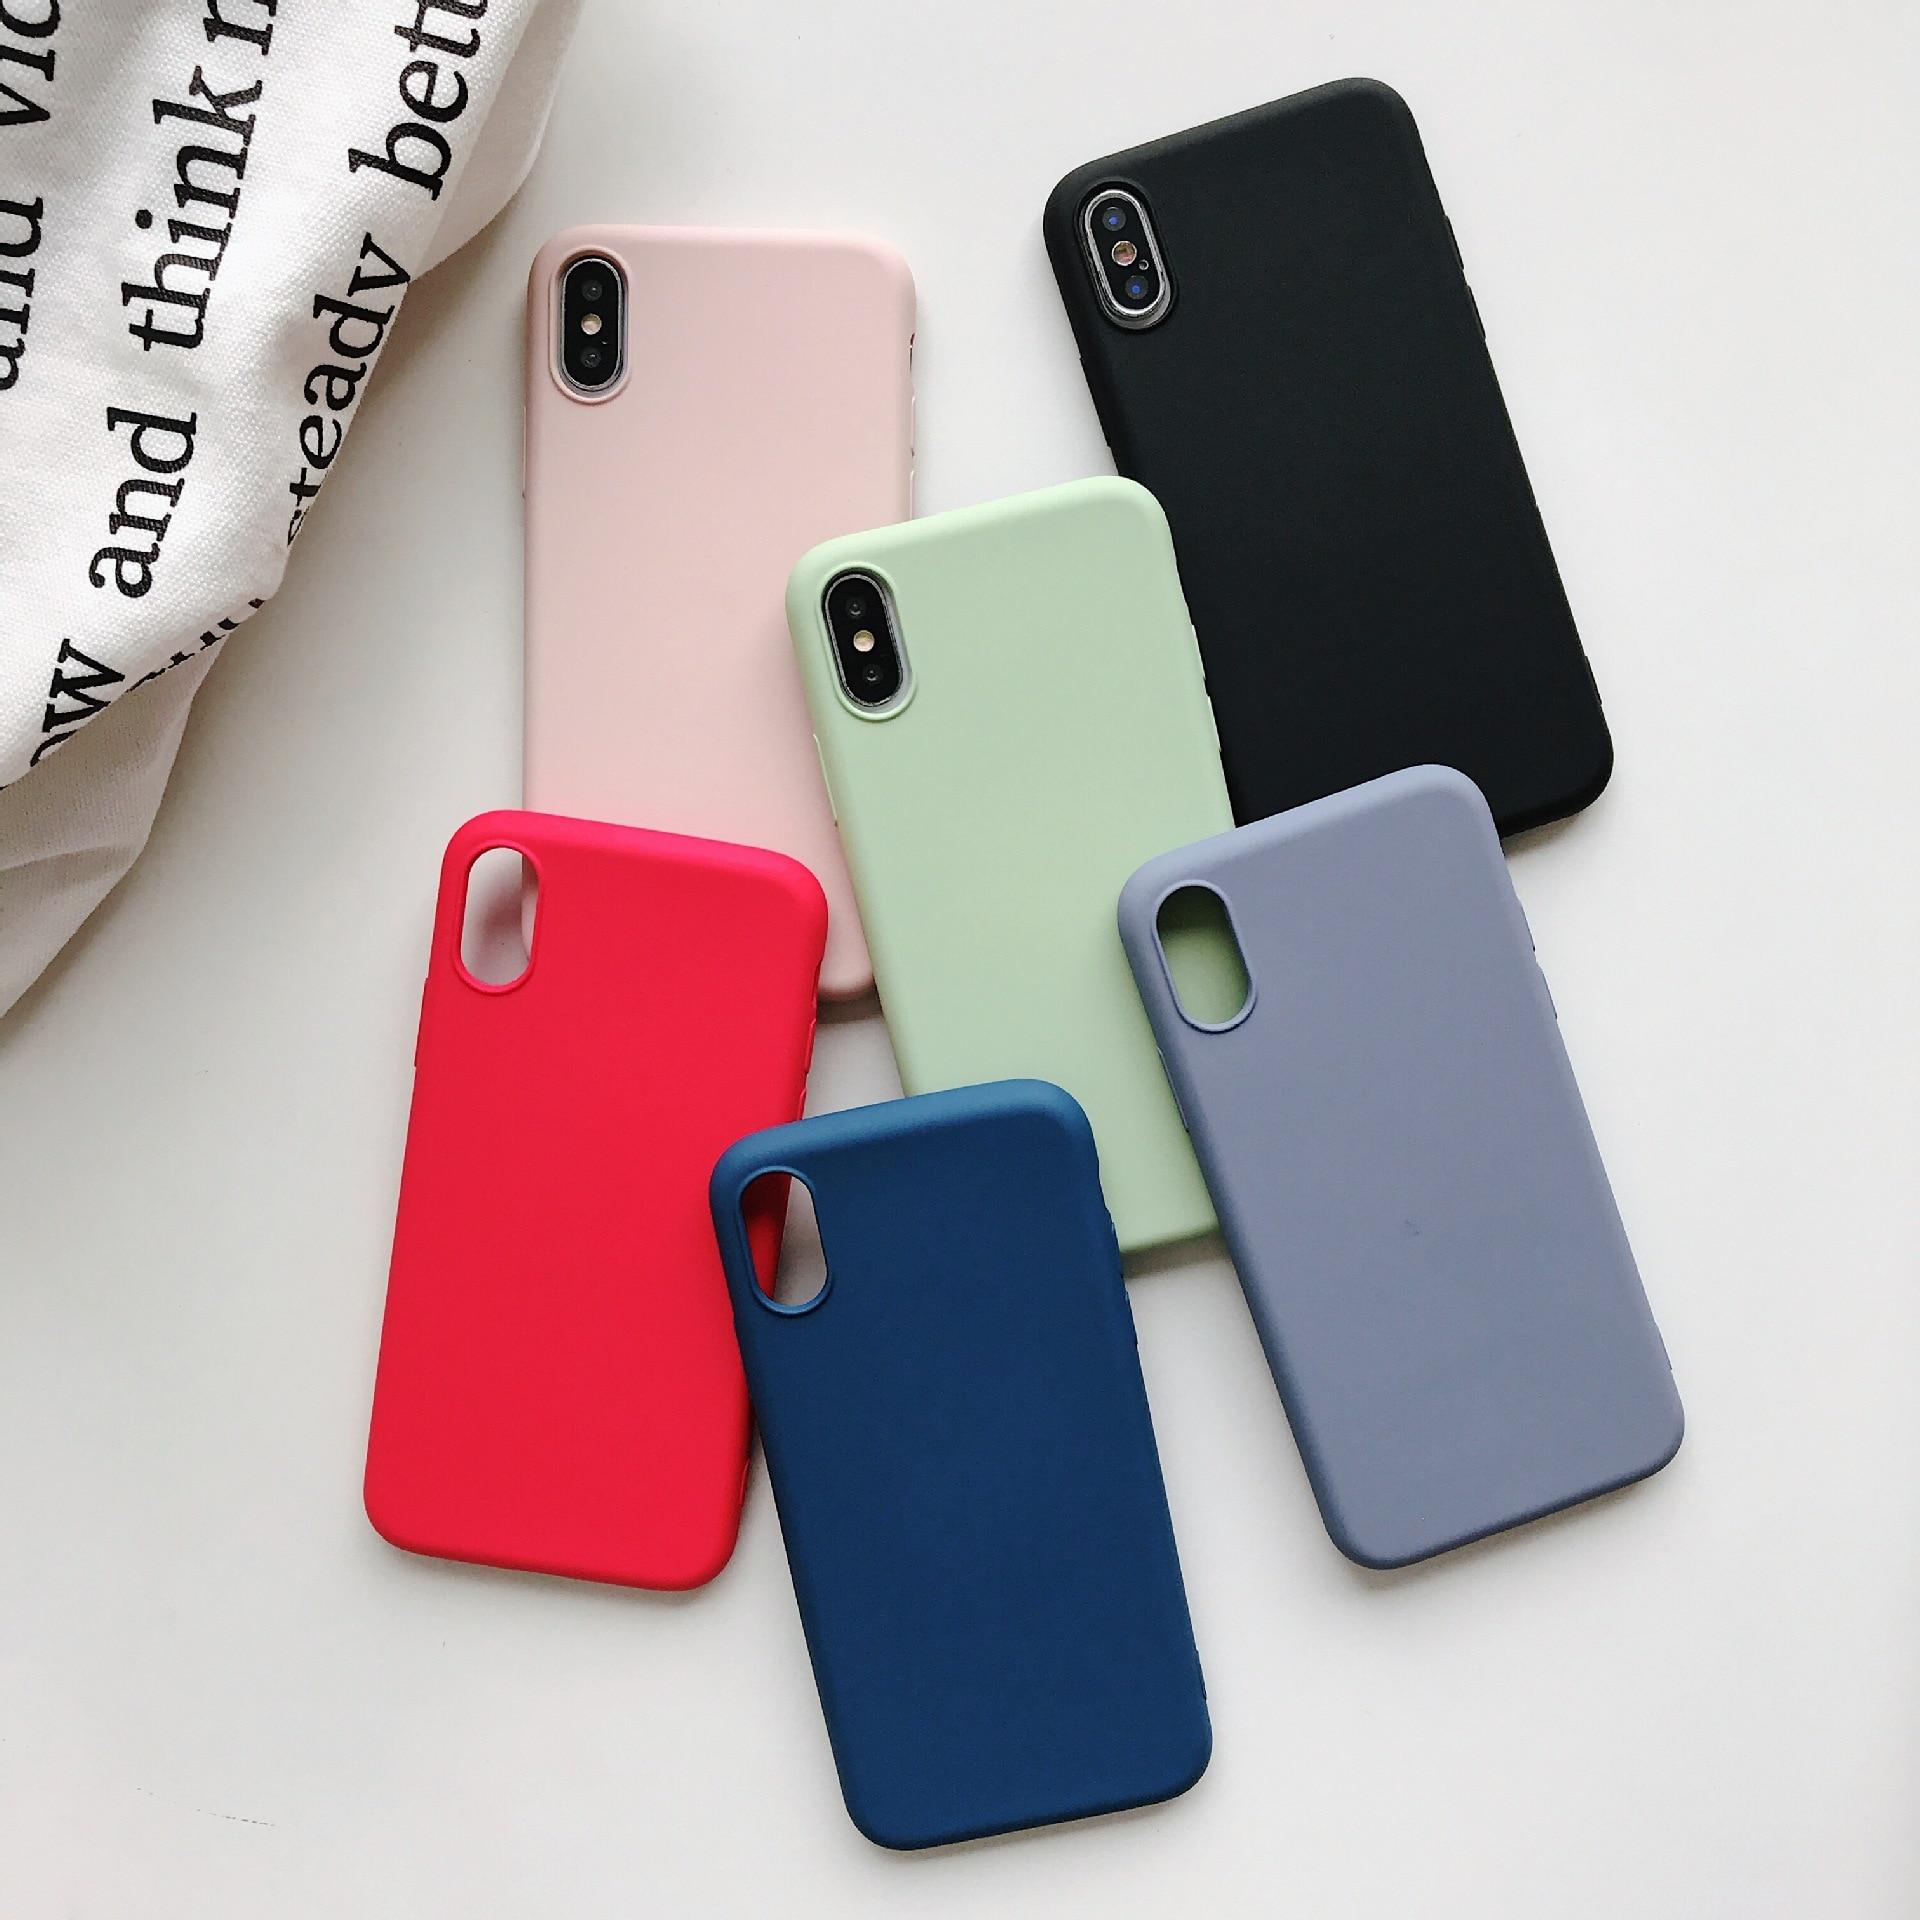 El logotipo Original funda para iPhone 7 7 6 6s Plus, iPhone funda de silicona Color caramelo Coque Capa para iPhone X Xs X 11 Pro Max XR